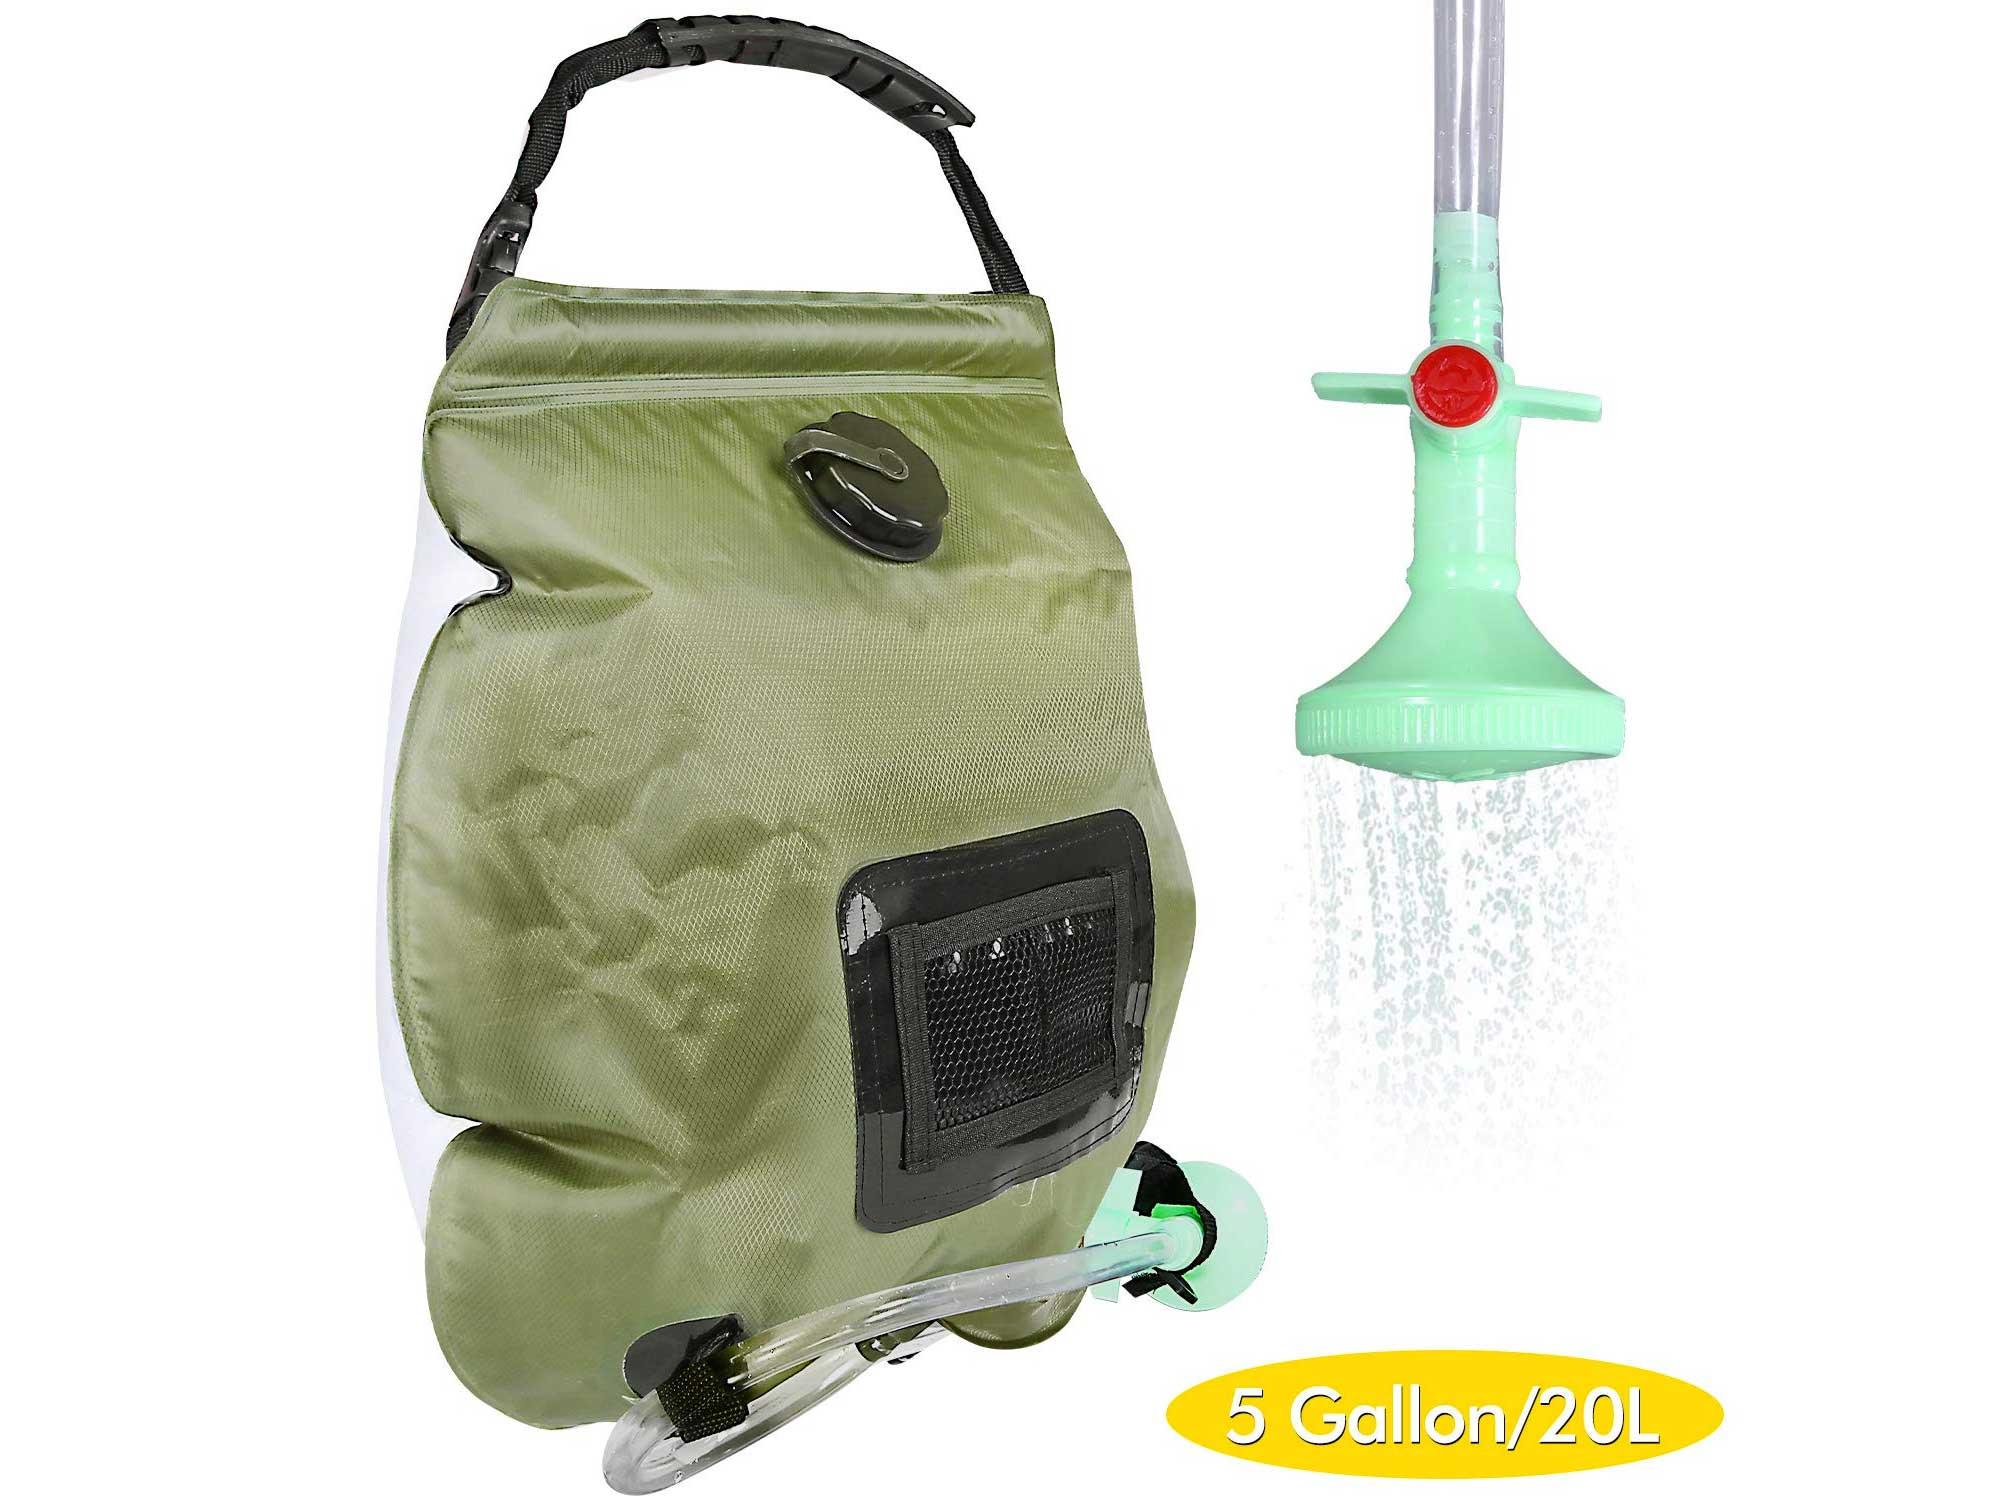 Solar Camping Shower Bag